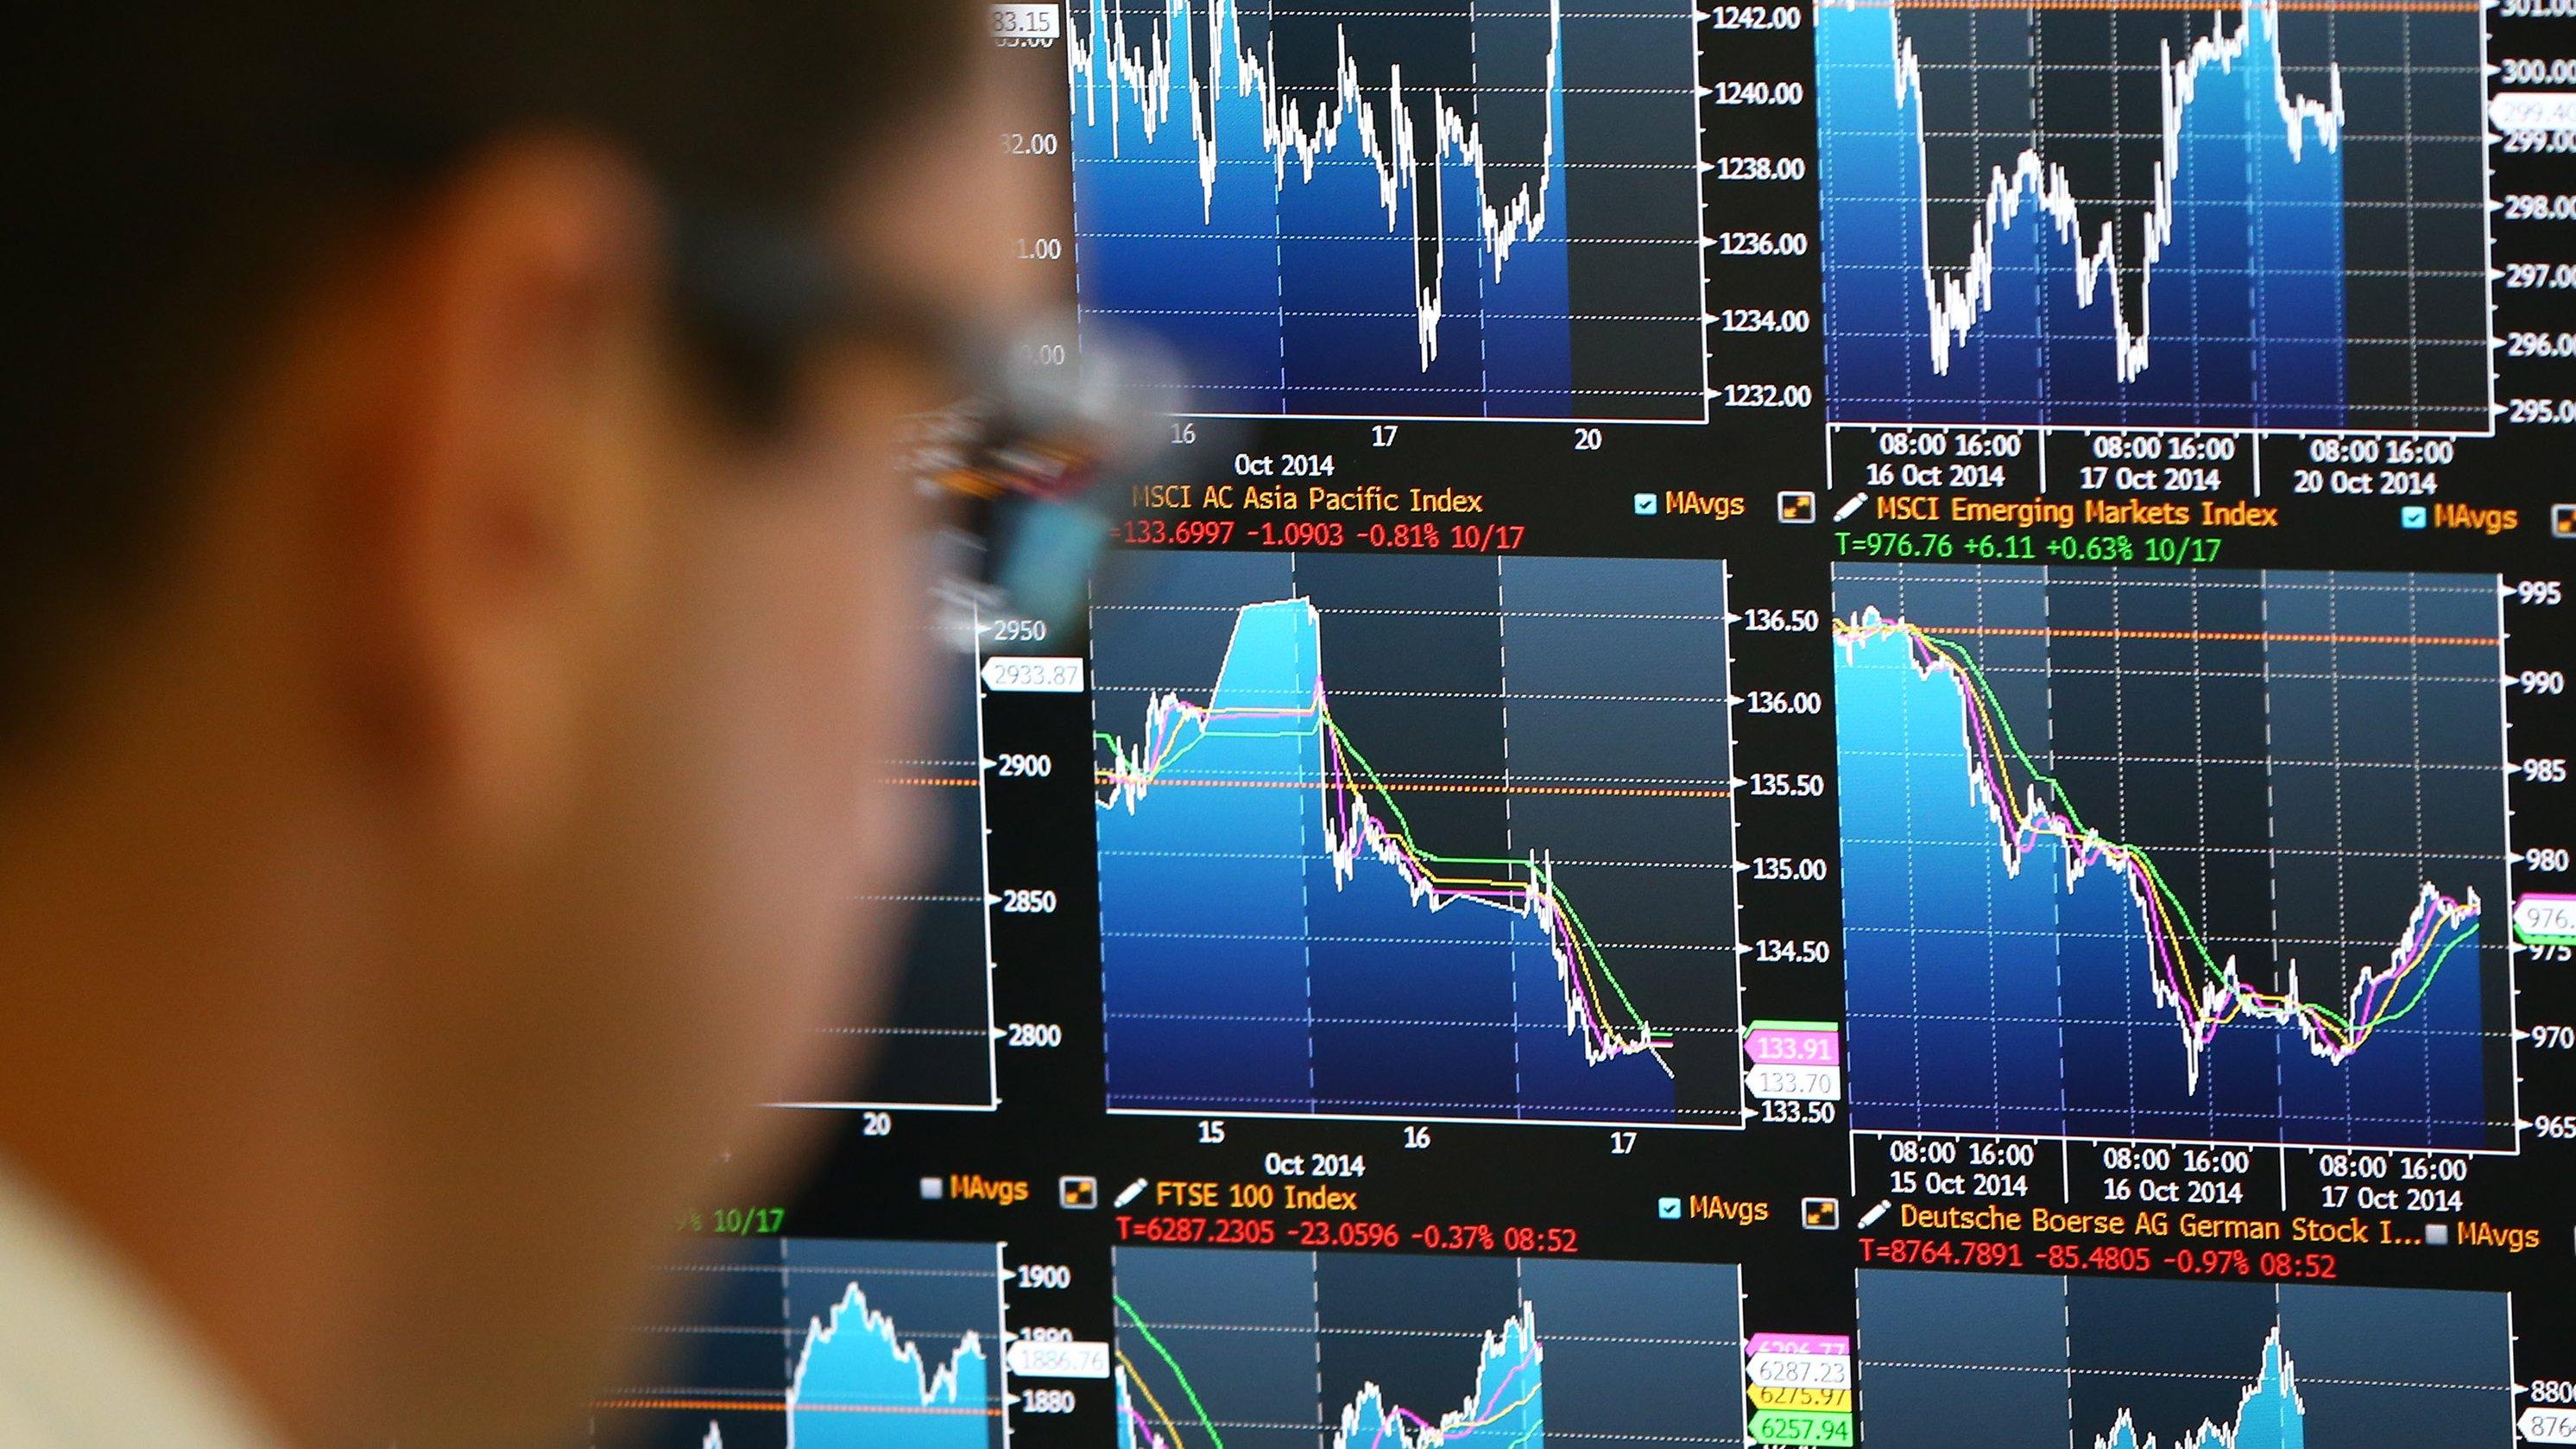 Markets Stabilise After Turbulence Last Week